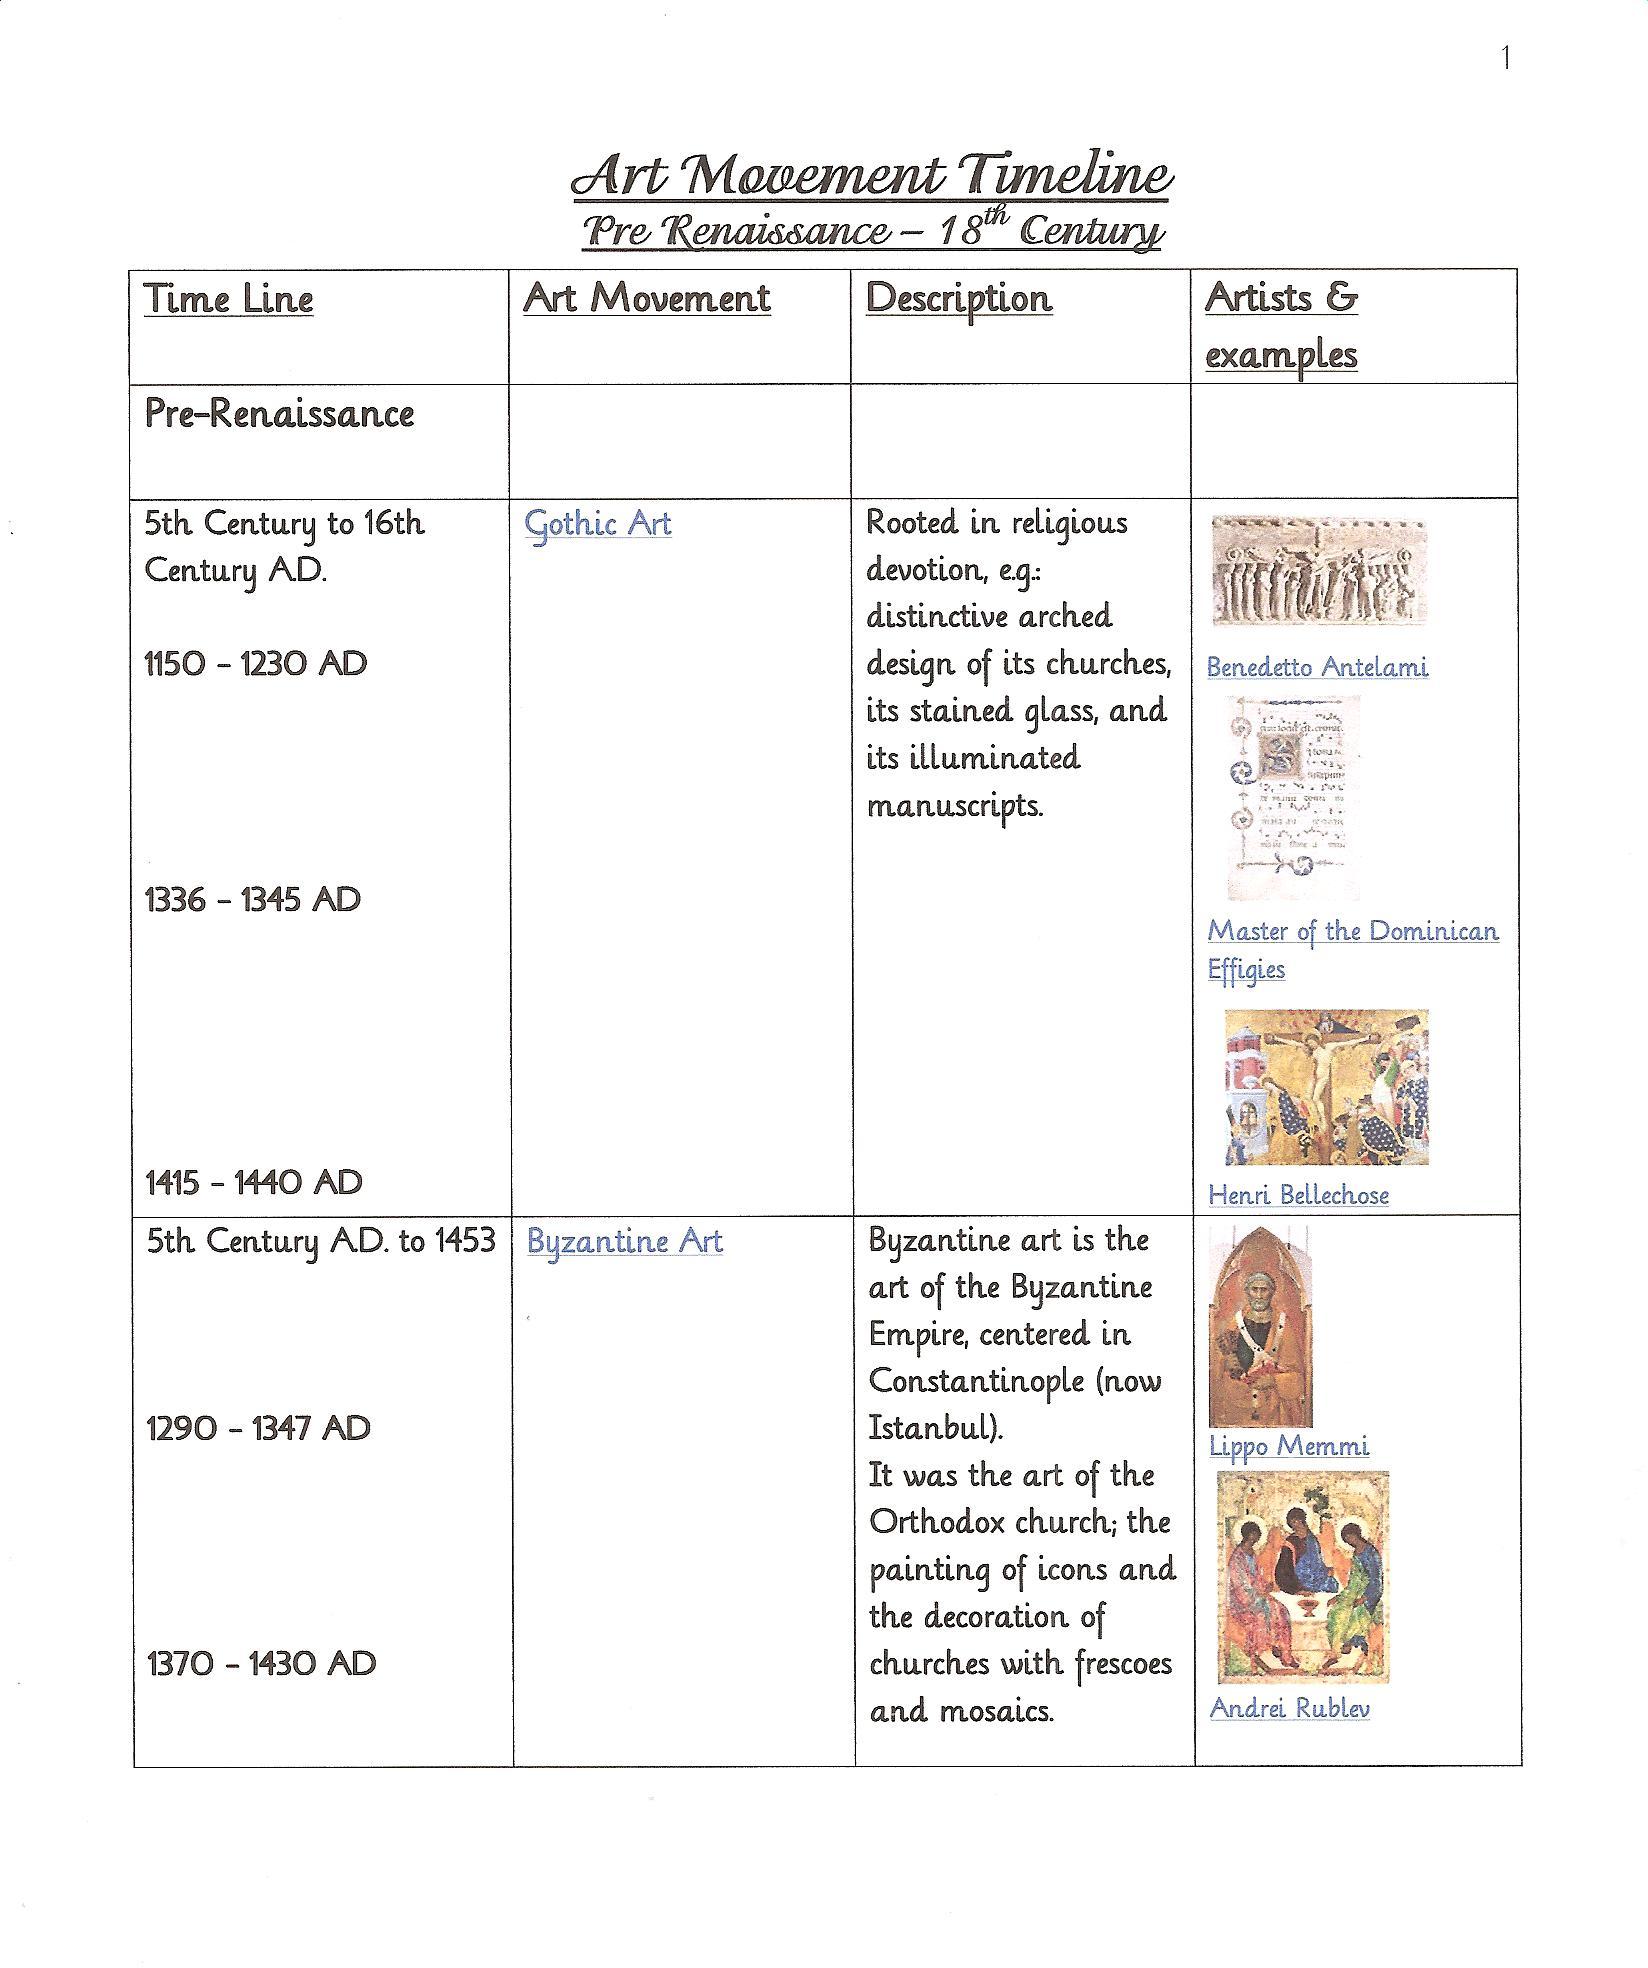 Art Era Timeline 1 Pre Renaissance To 18th Century